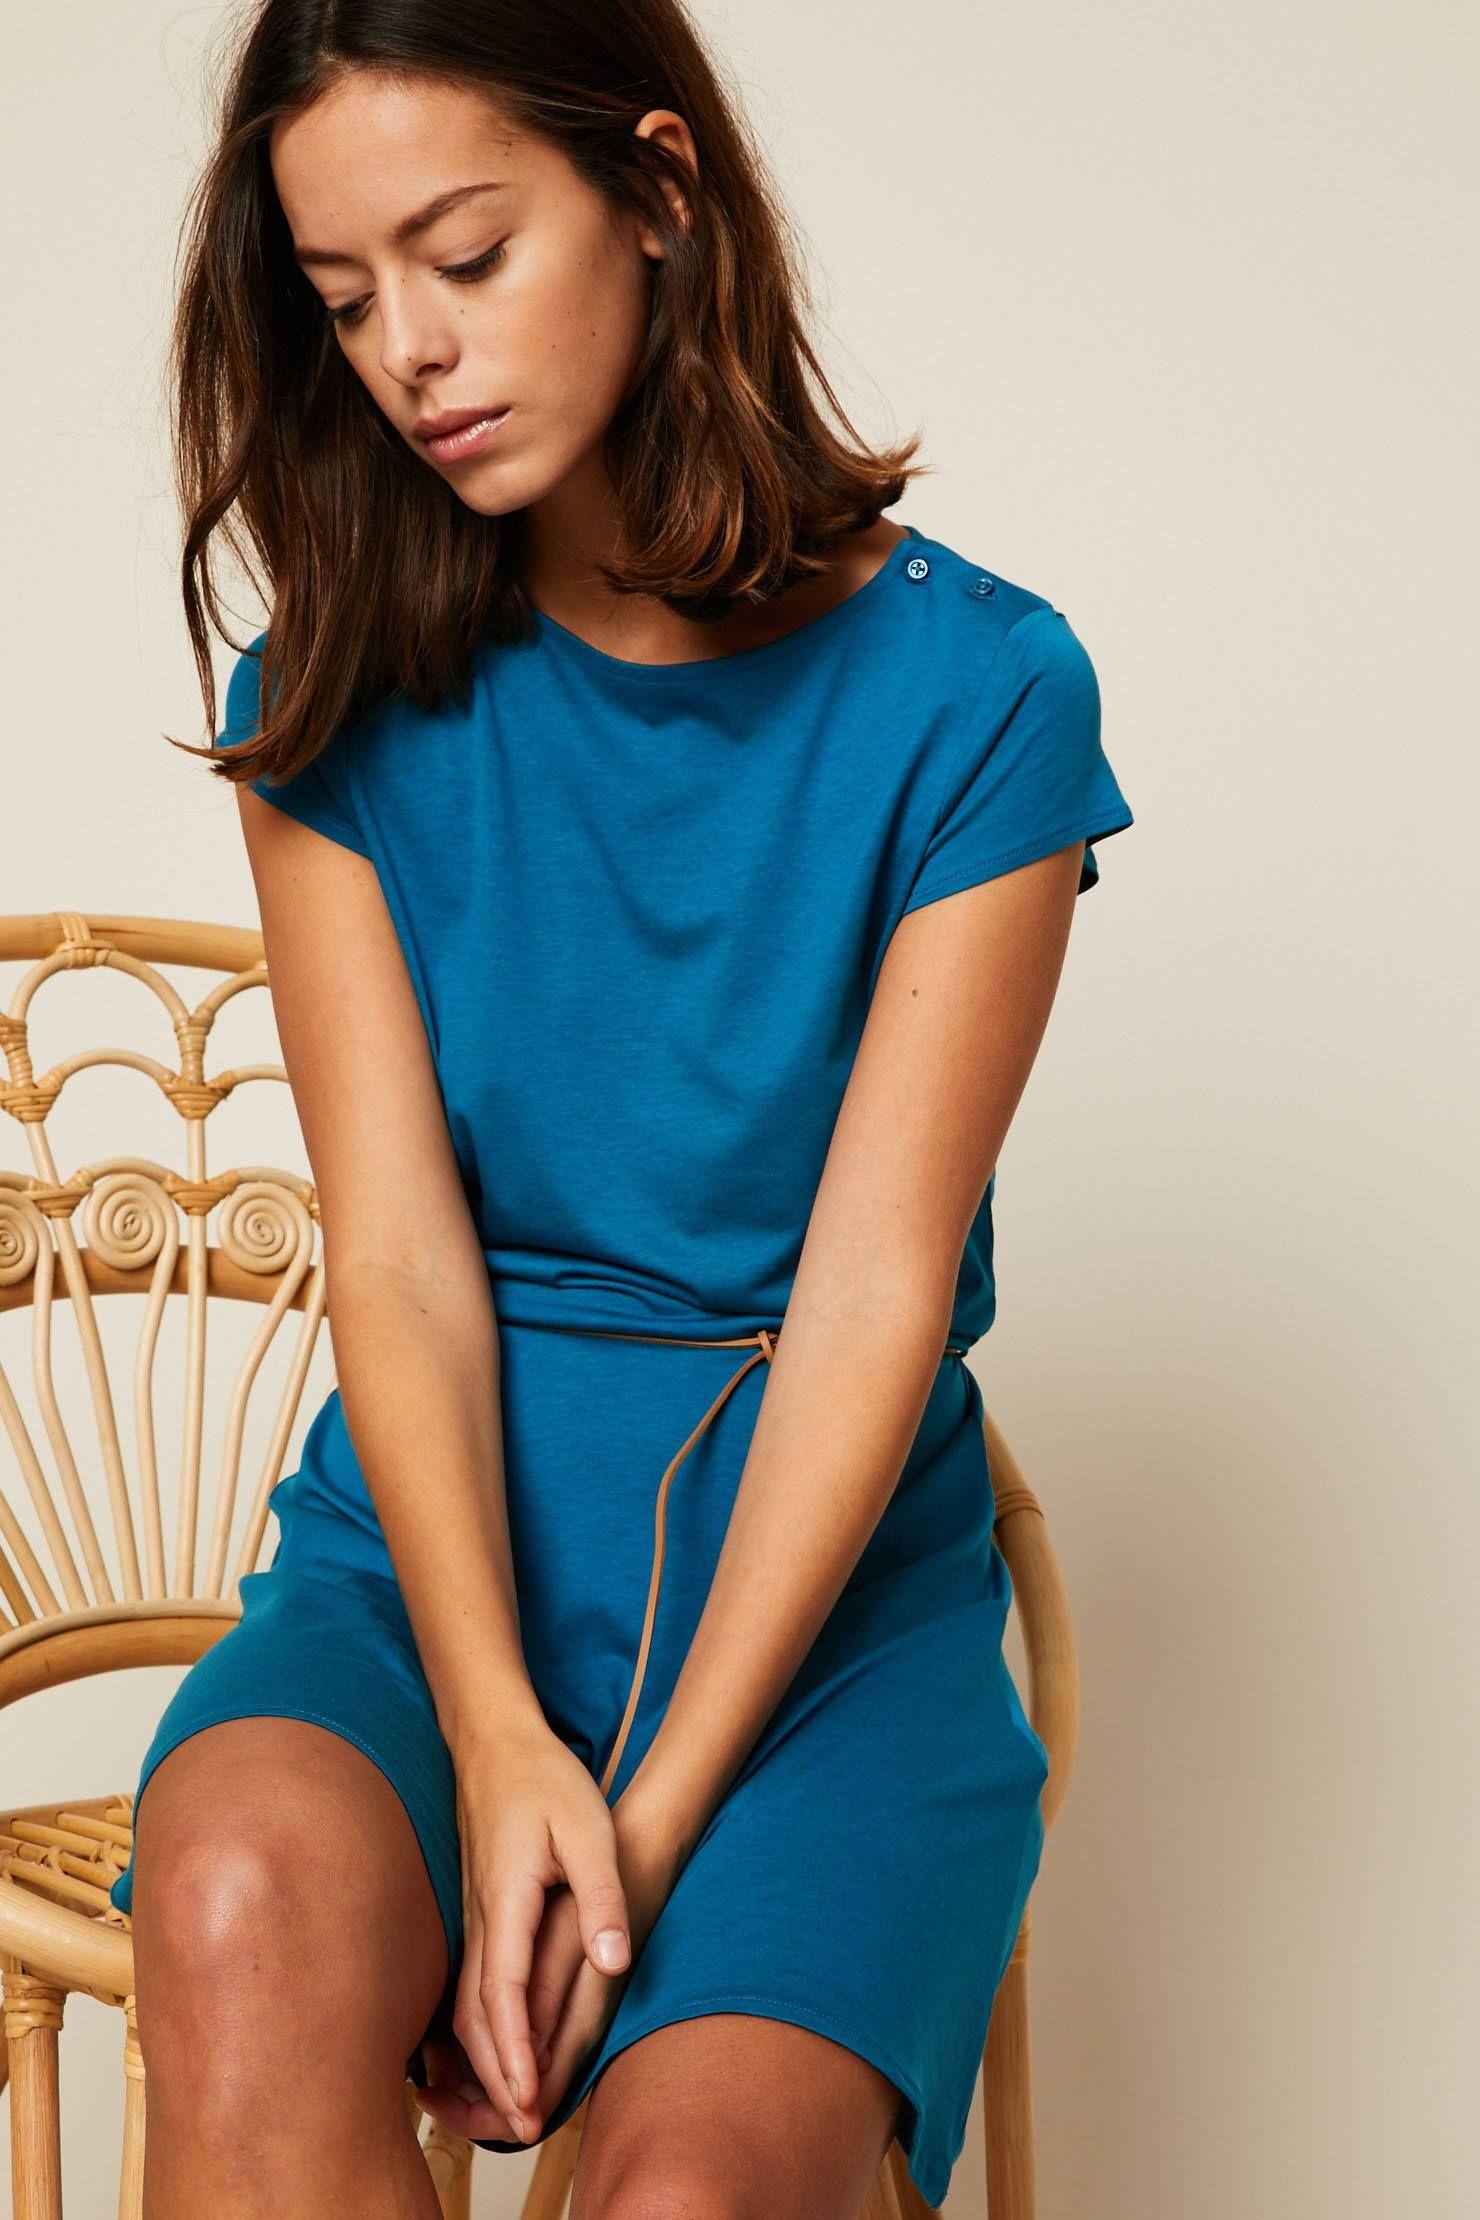 7f2a3ca7faf Sessun Salome Robe courte ceinturée bleu pas cher prix Robe Monshowroom  85.00 € TTC